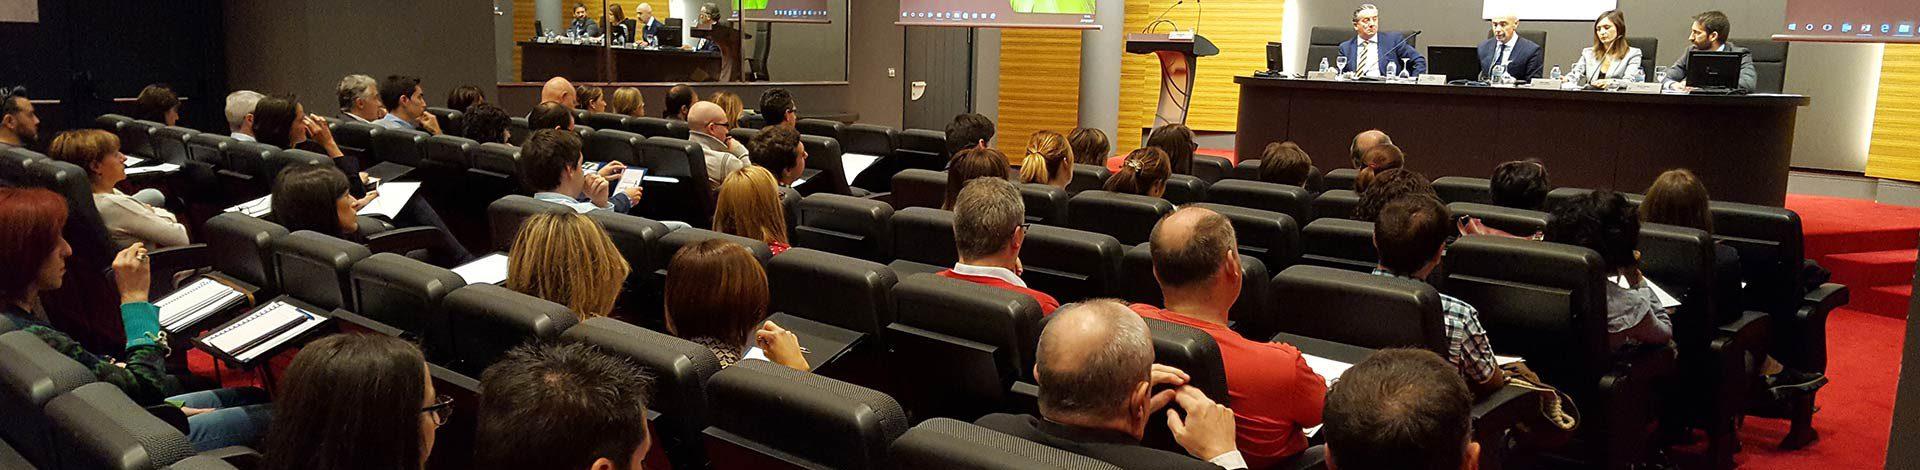 Igarle jornada Sayma sobre SII y dimesión digital Vitoria, Donostia y Bilbao